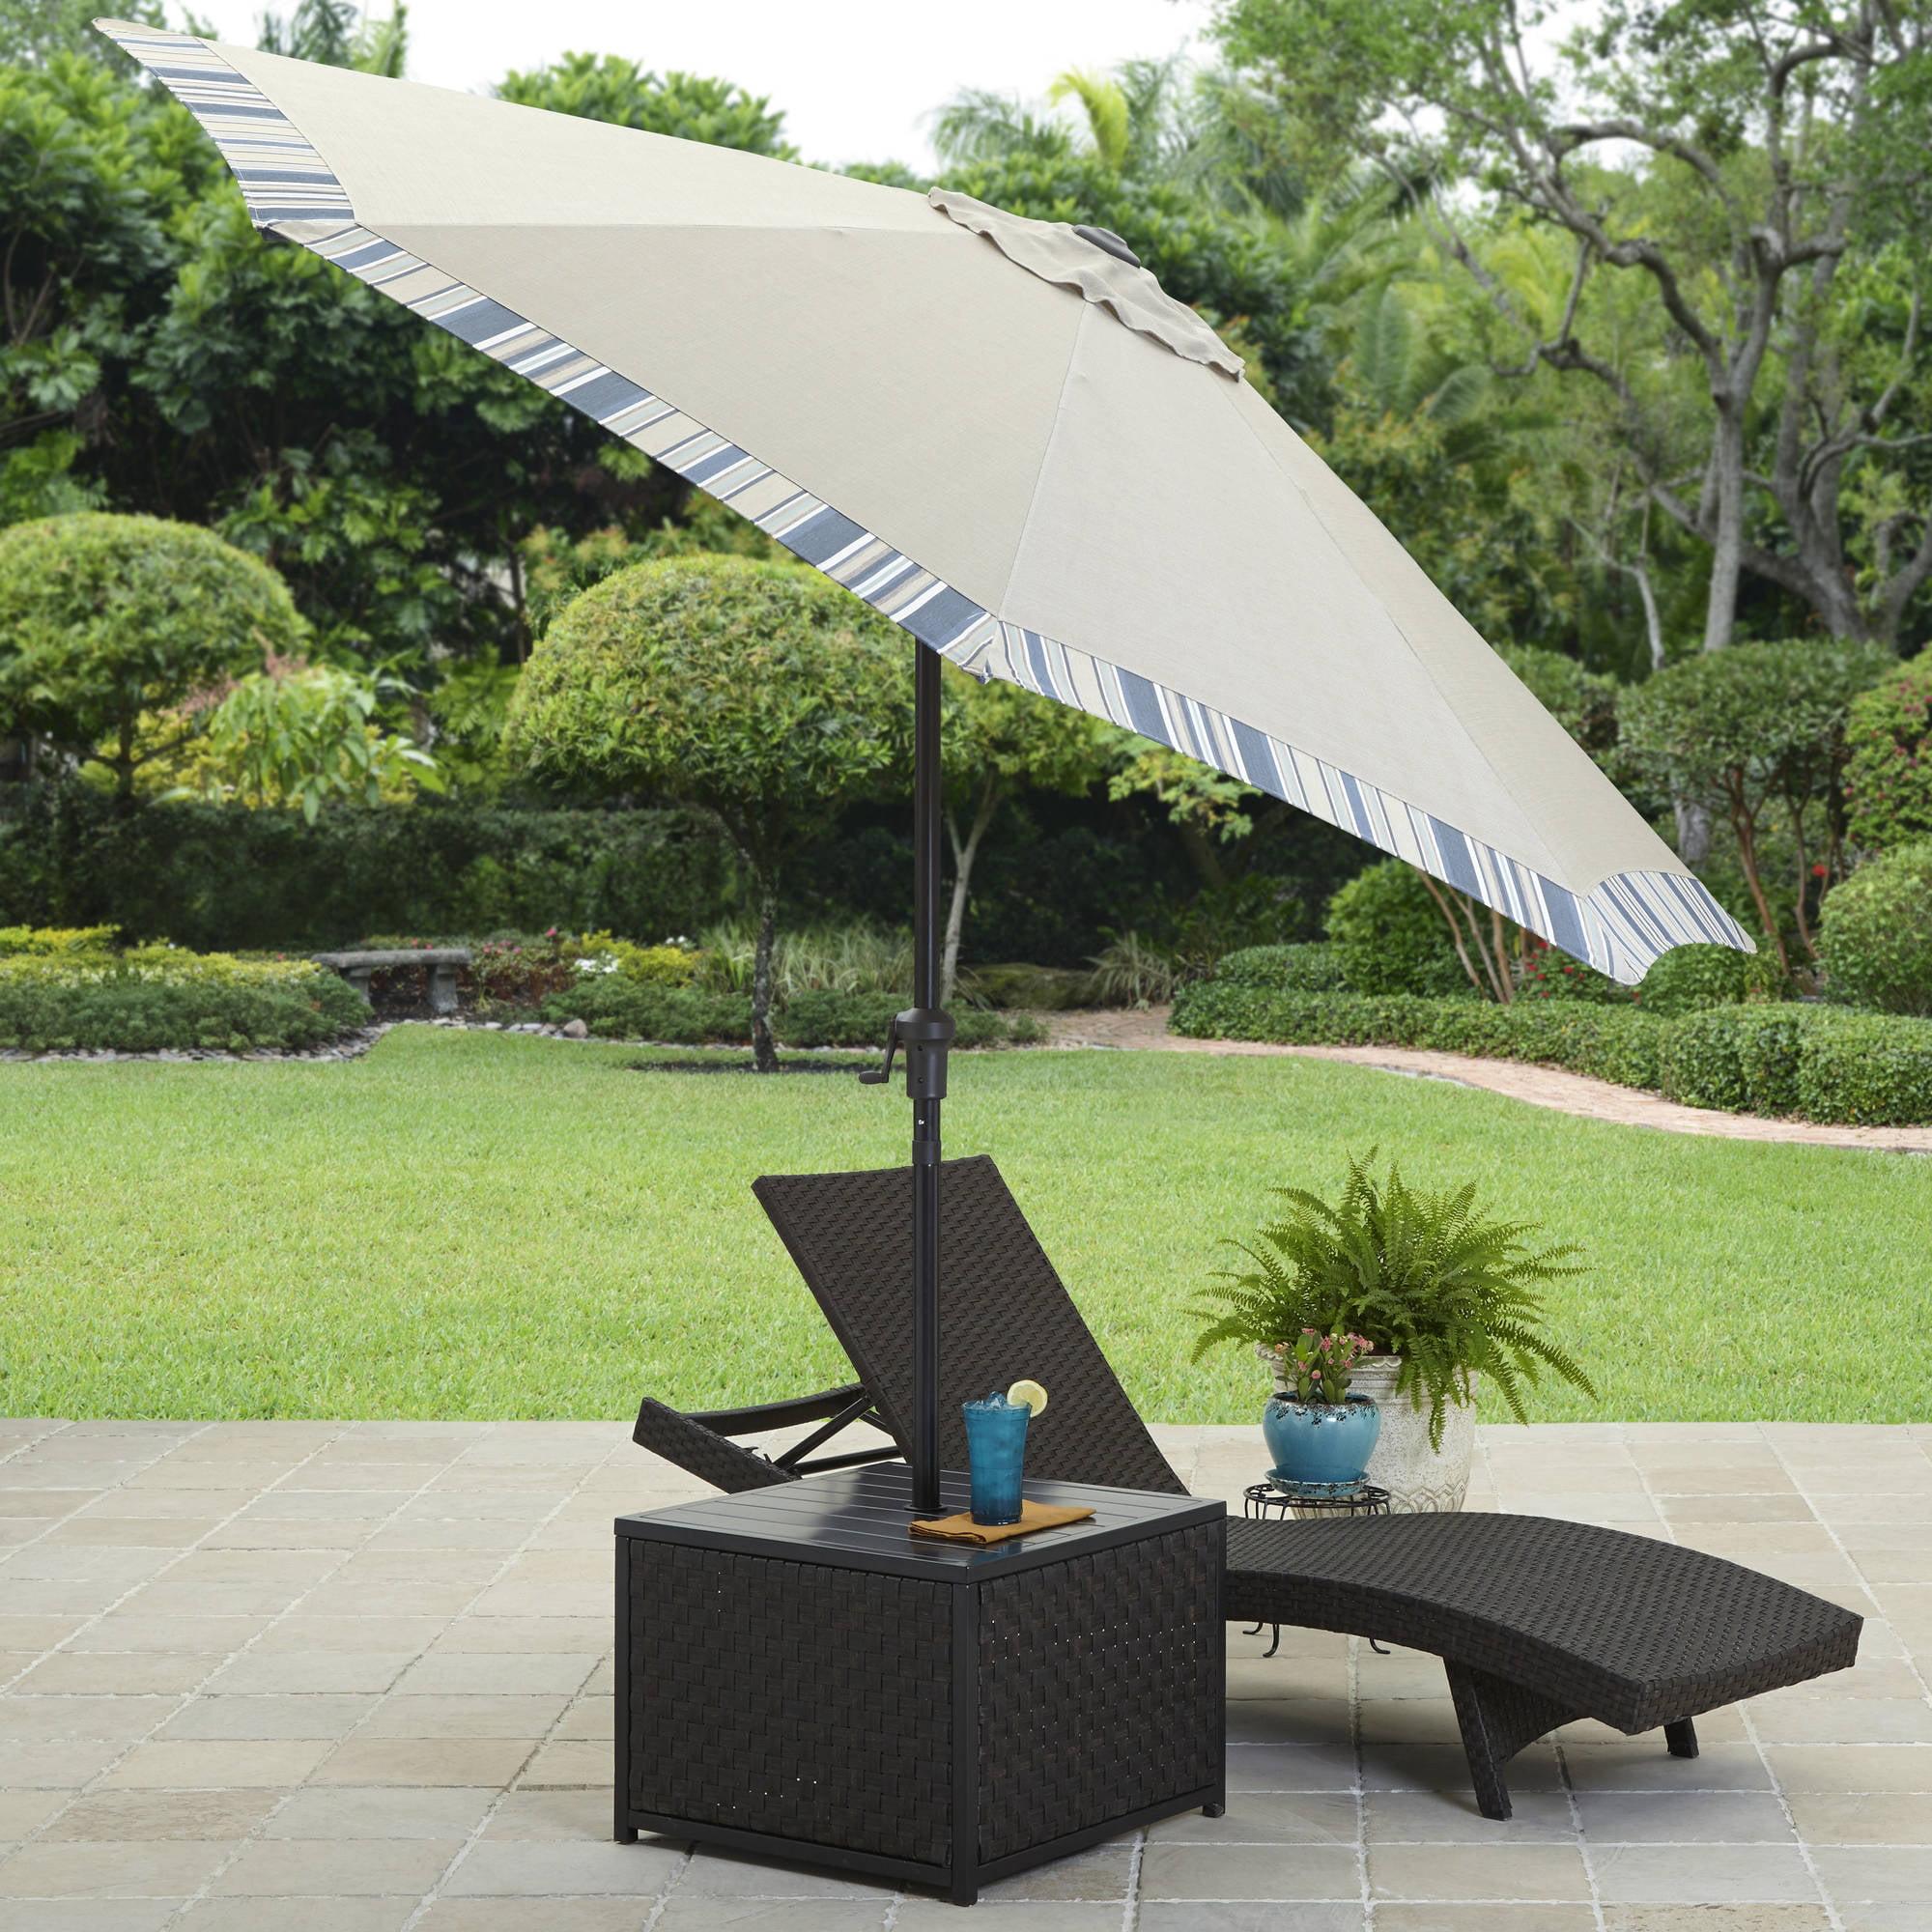 Better Homes and Gardens Avila Beach Umbrella Table